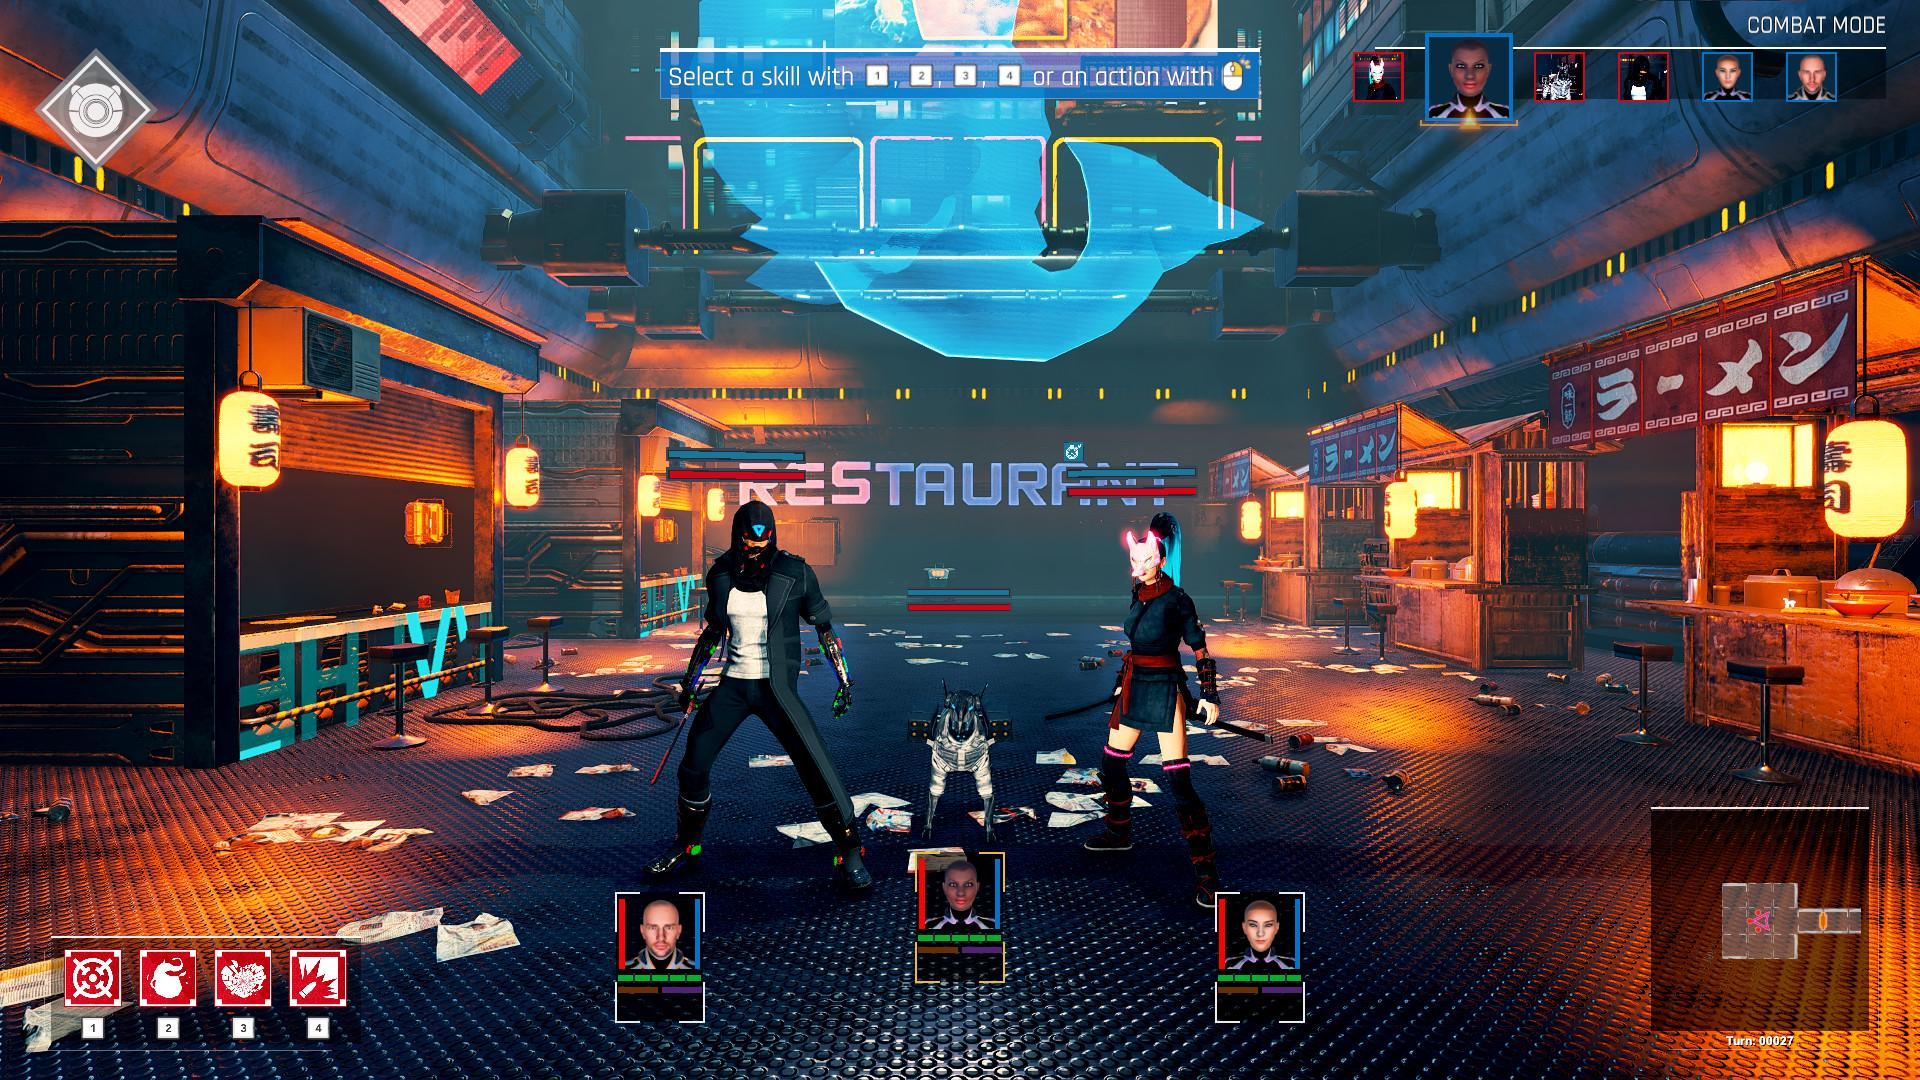 cyberpunk, cyberpunk games, video games, video game news, video game media, best cyberpunk games